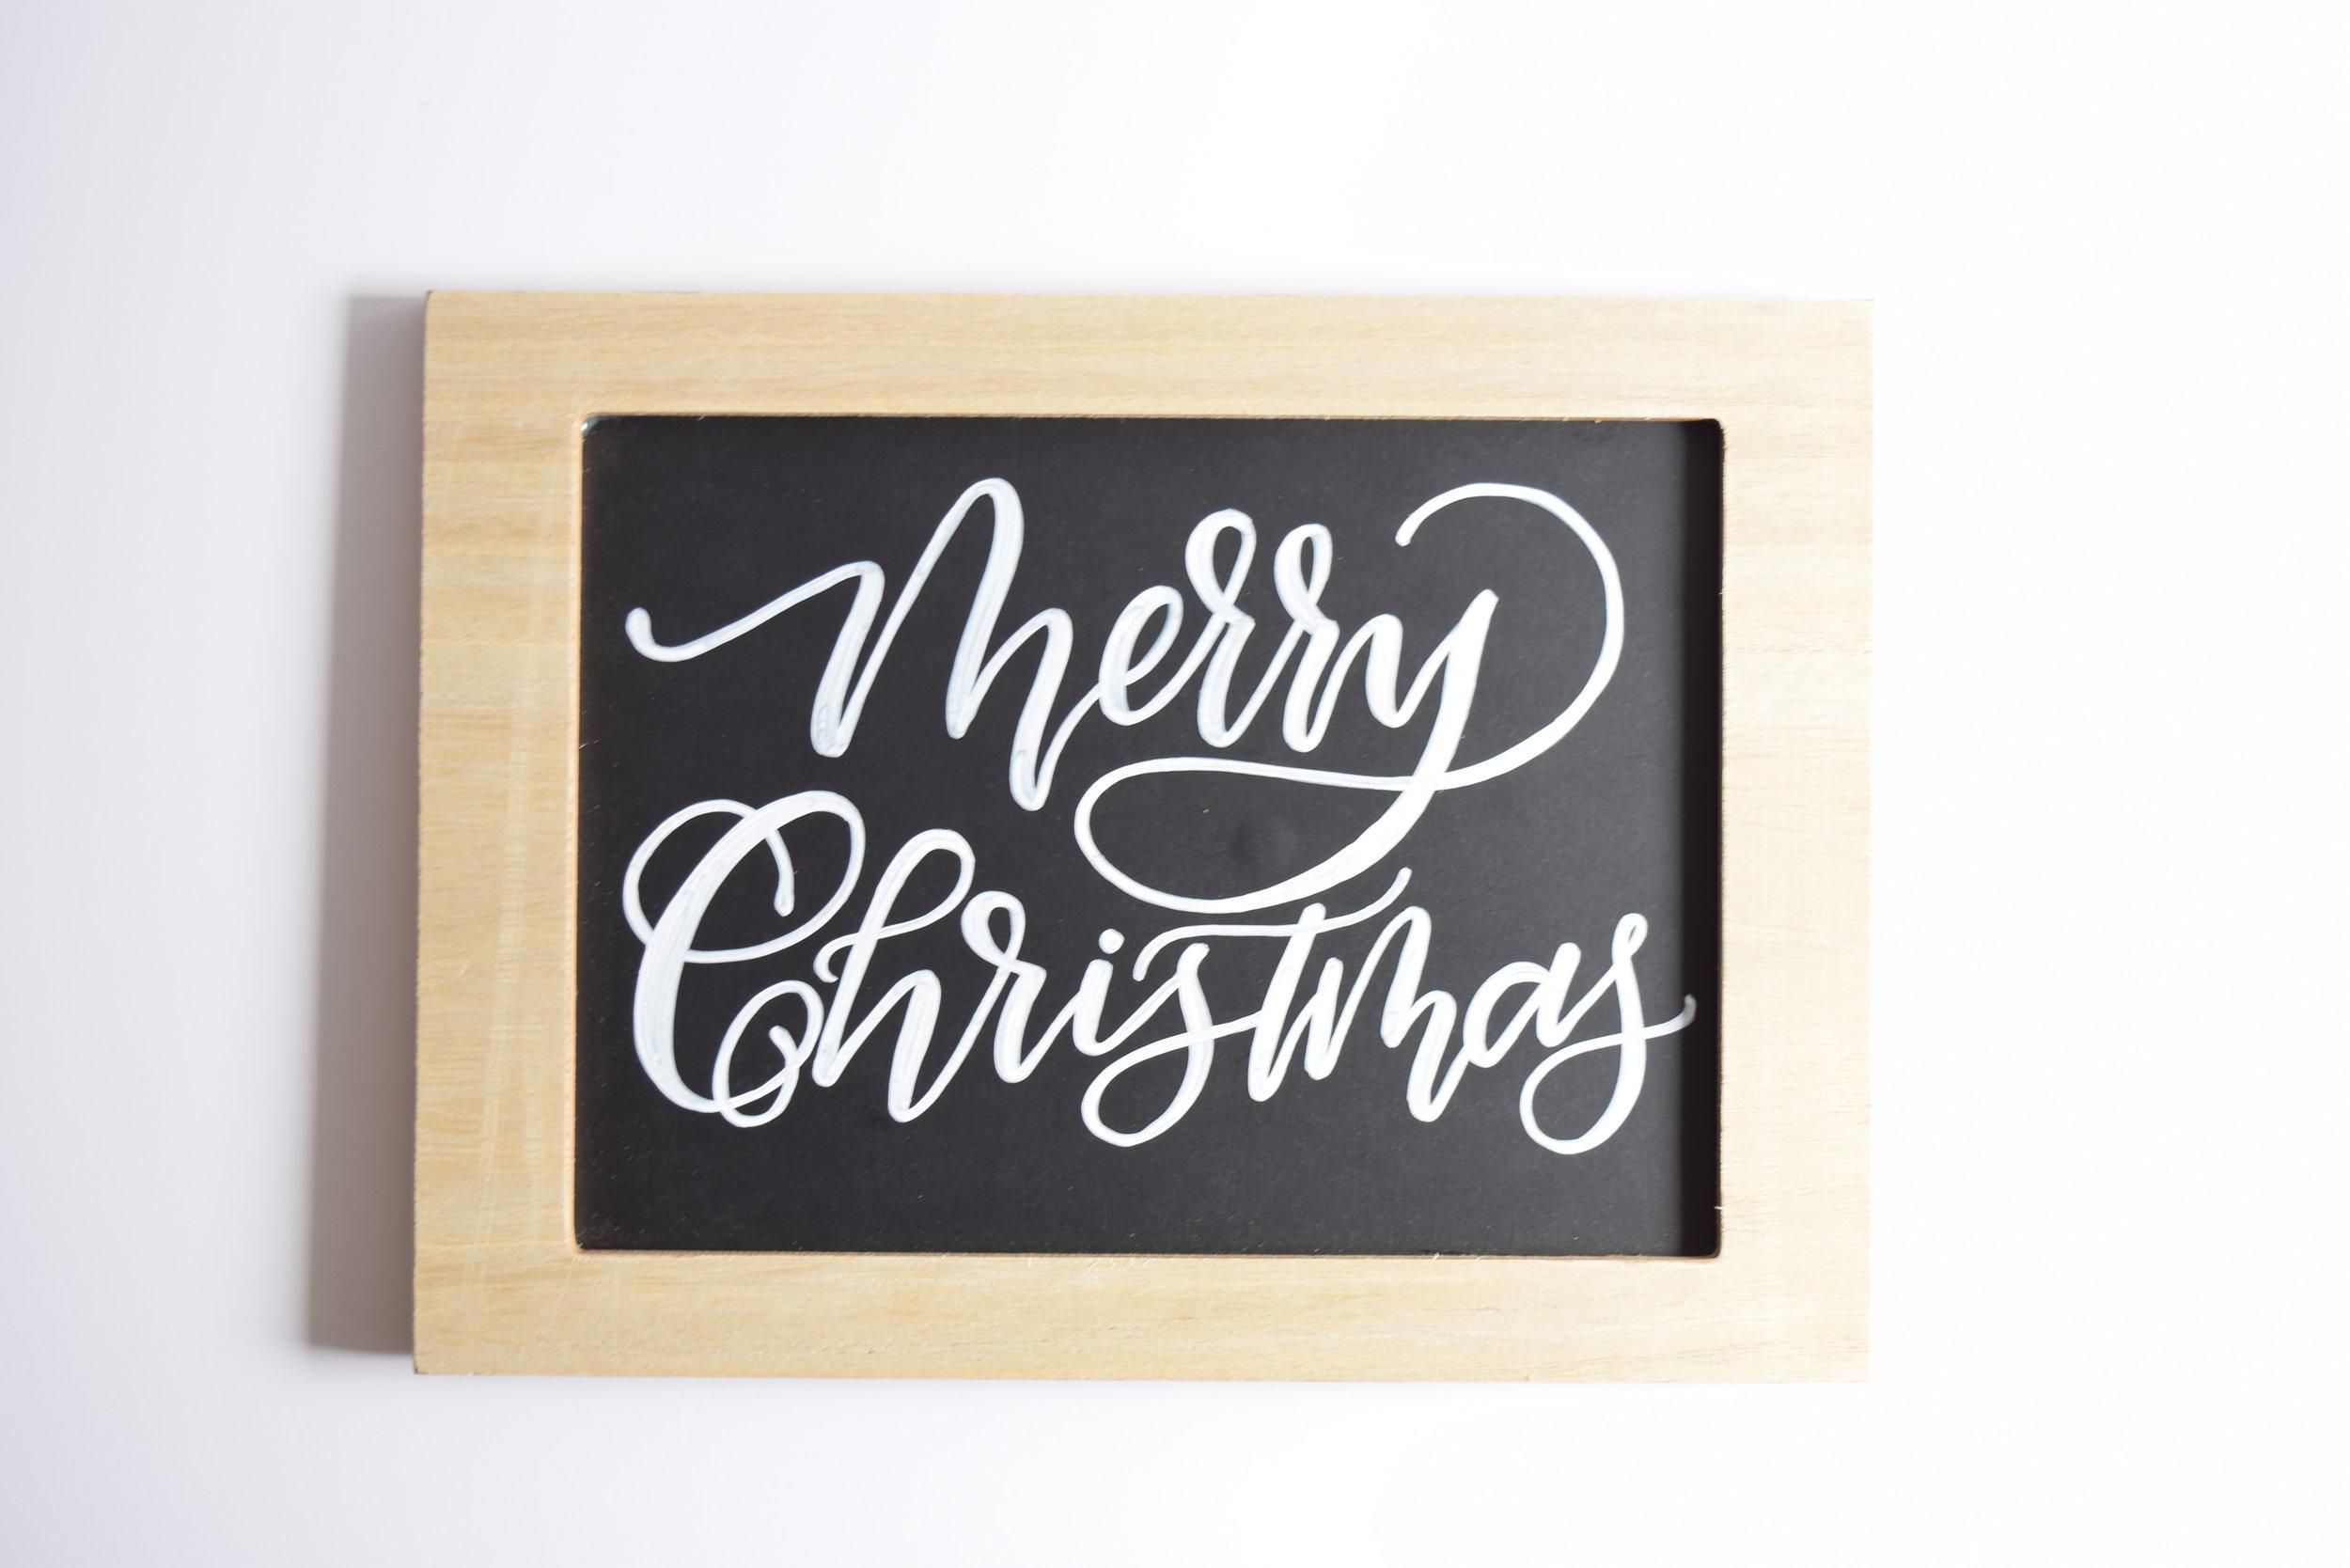 Merry Christmas Custom Chalkboard   Personalized Sign   Christmas Decor   Christmas Chalk Art   Farmhouse Sign   Chalk Art and Calligraphy